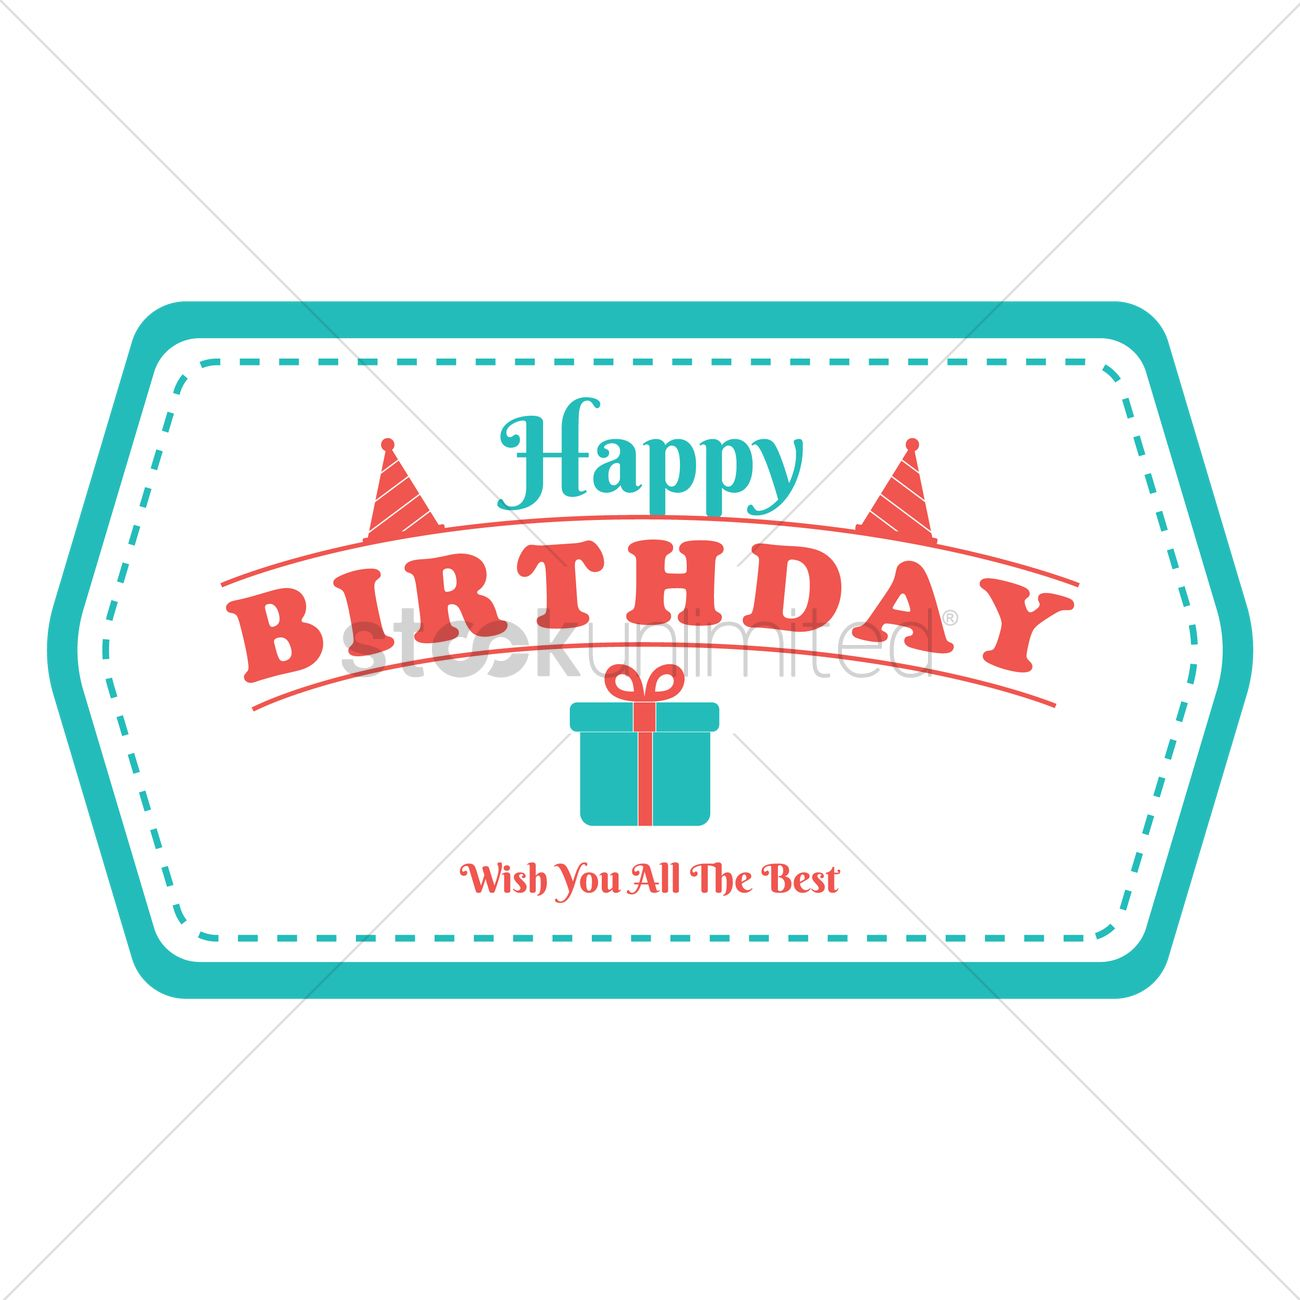 Happy Birthday Label Design Vector Image 1799563